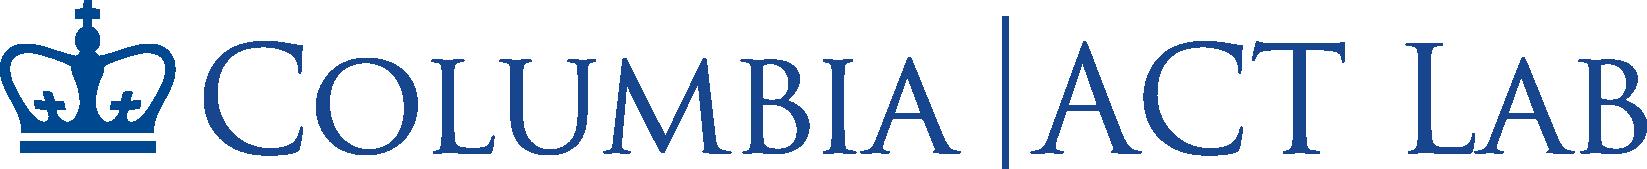 ACT Lab logo